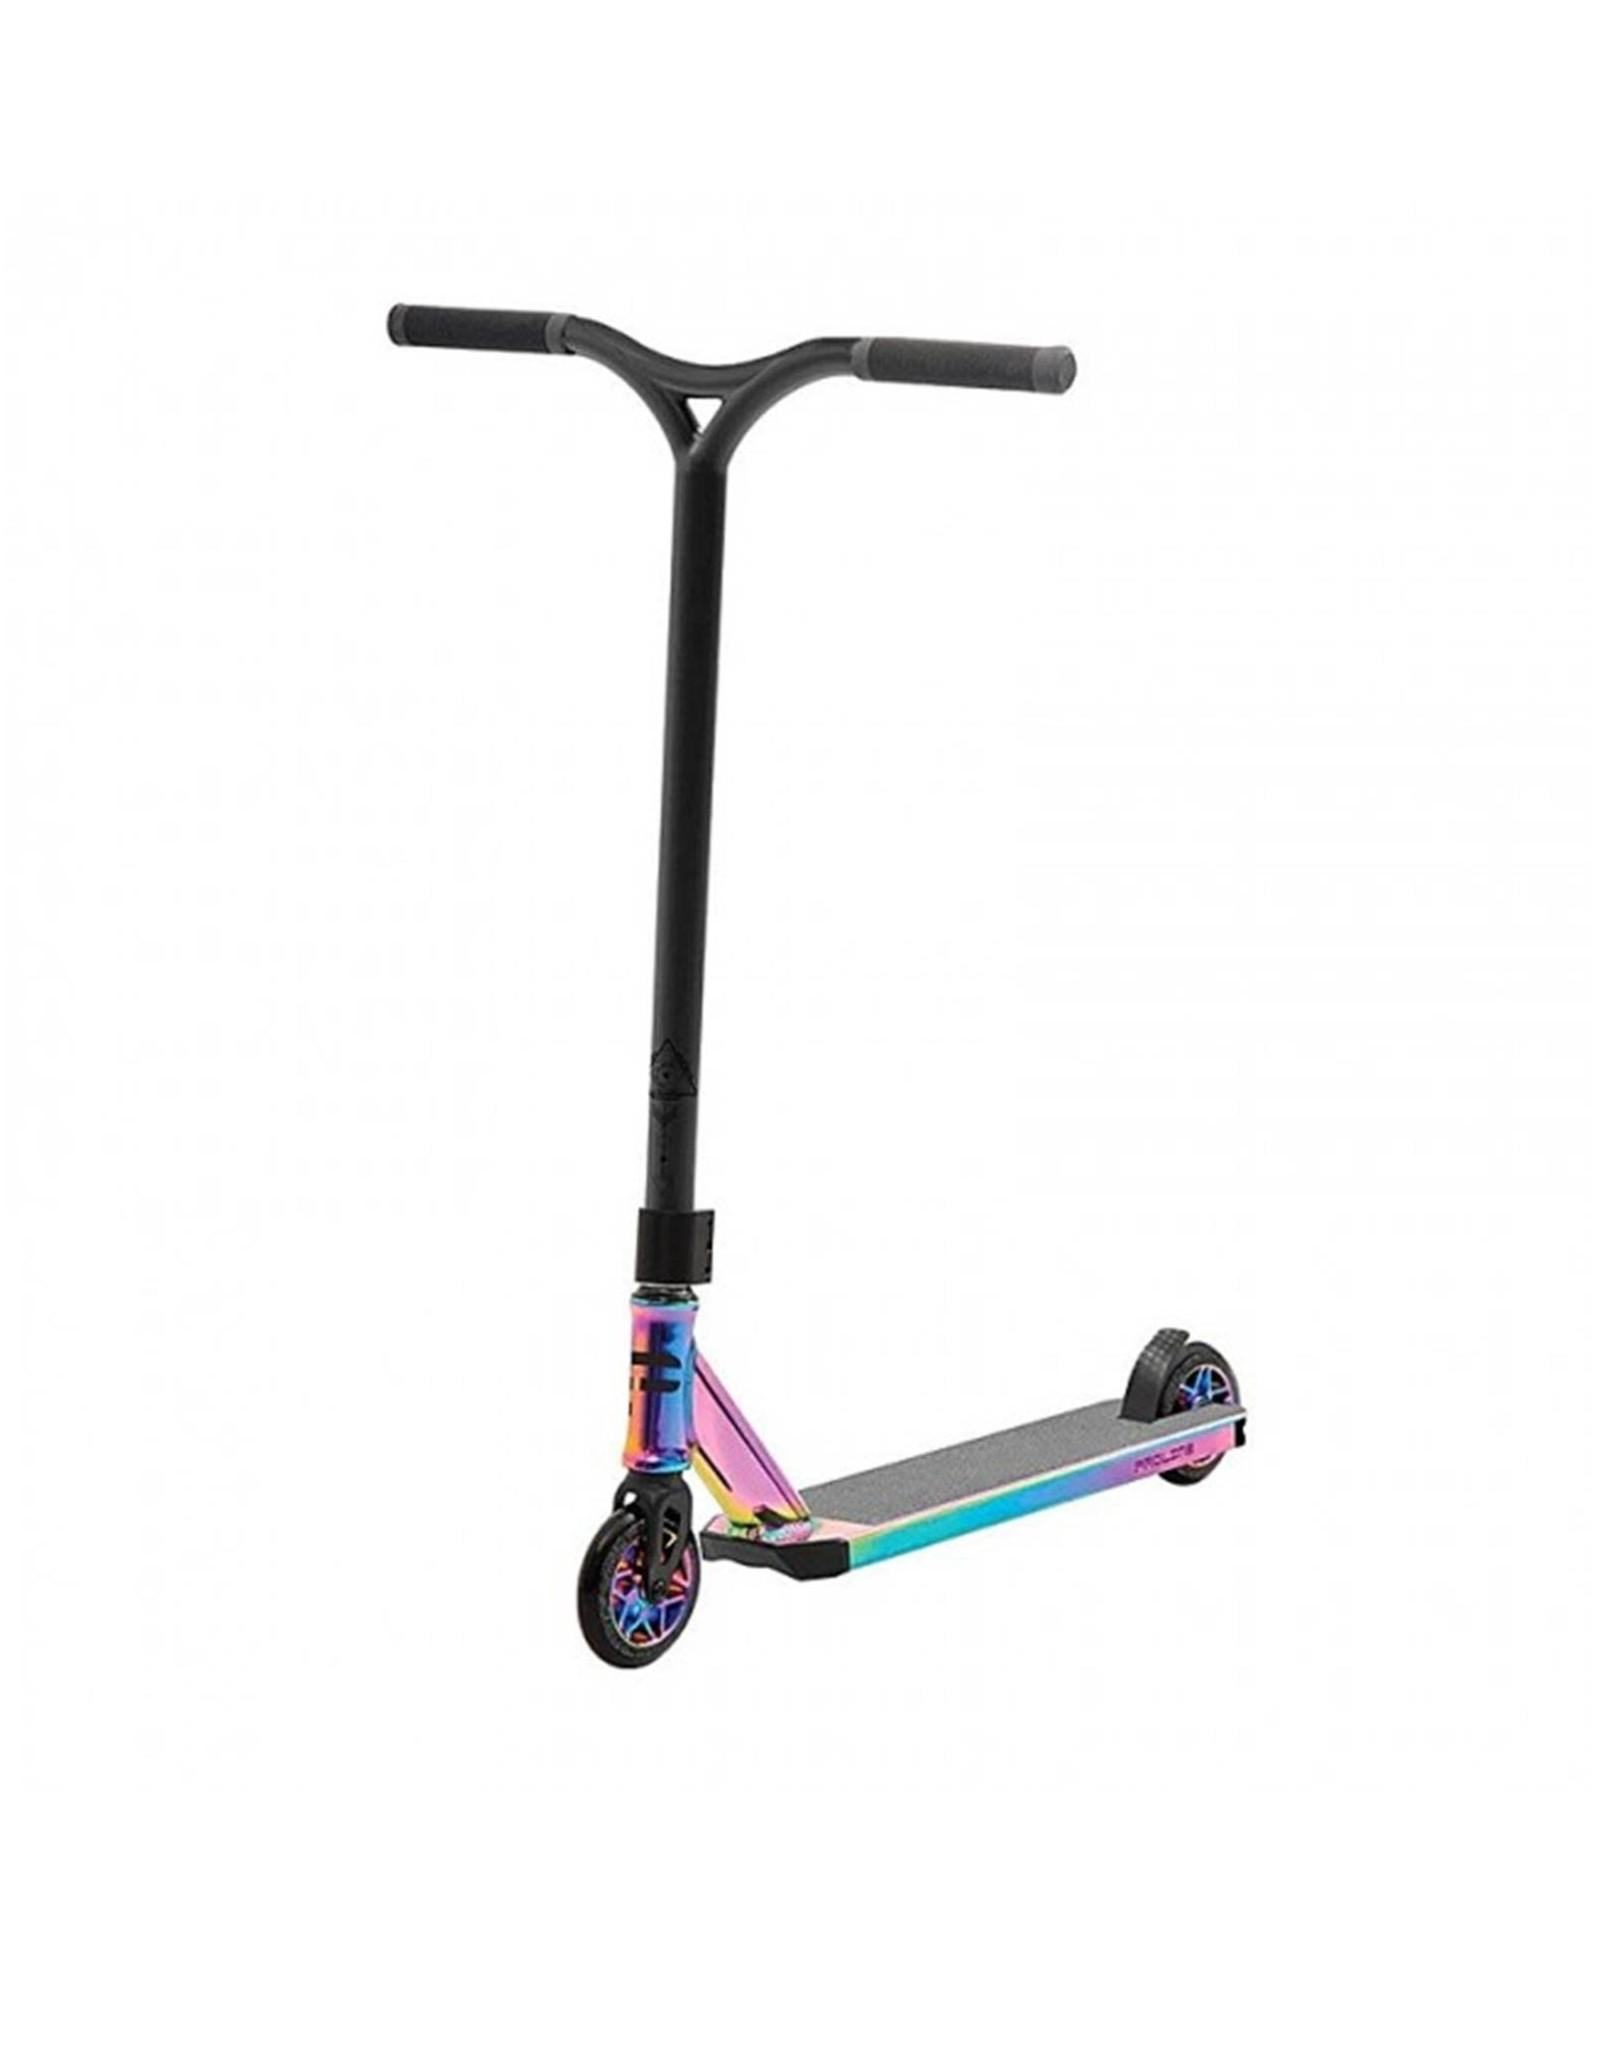 PROLINE Proline L2 Scooter Neo Chrome